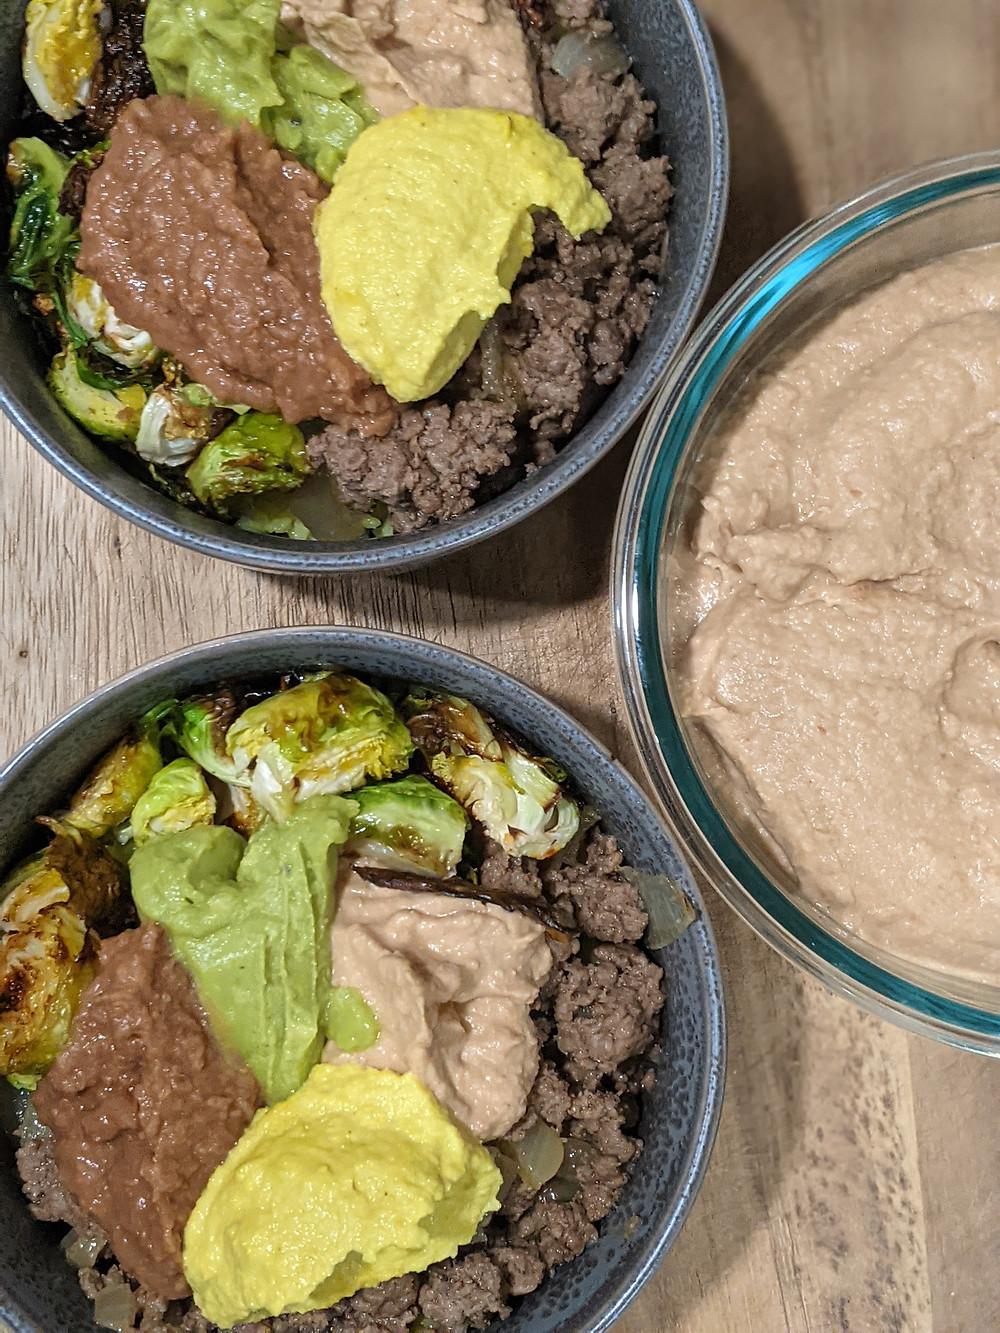 The Sunday Cookbook - Southwestern TruBeef and Veggie Bowls with Refried Bean Hummus - amanda macgregor - joseph centineo - food allergy recipes